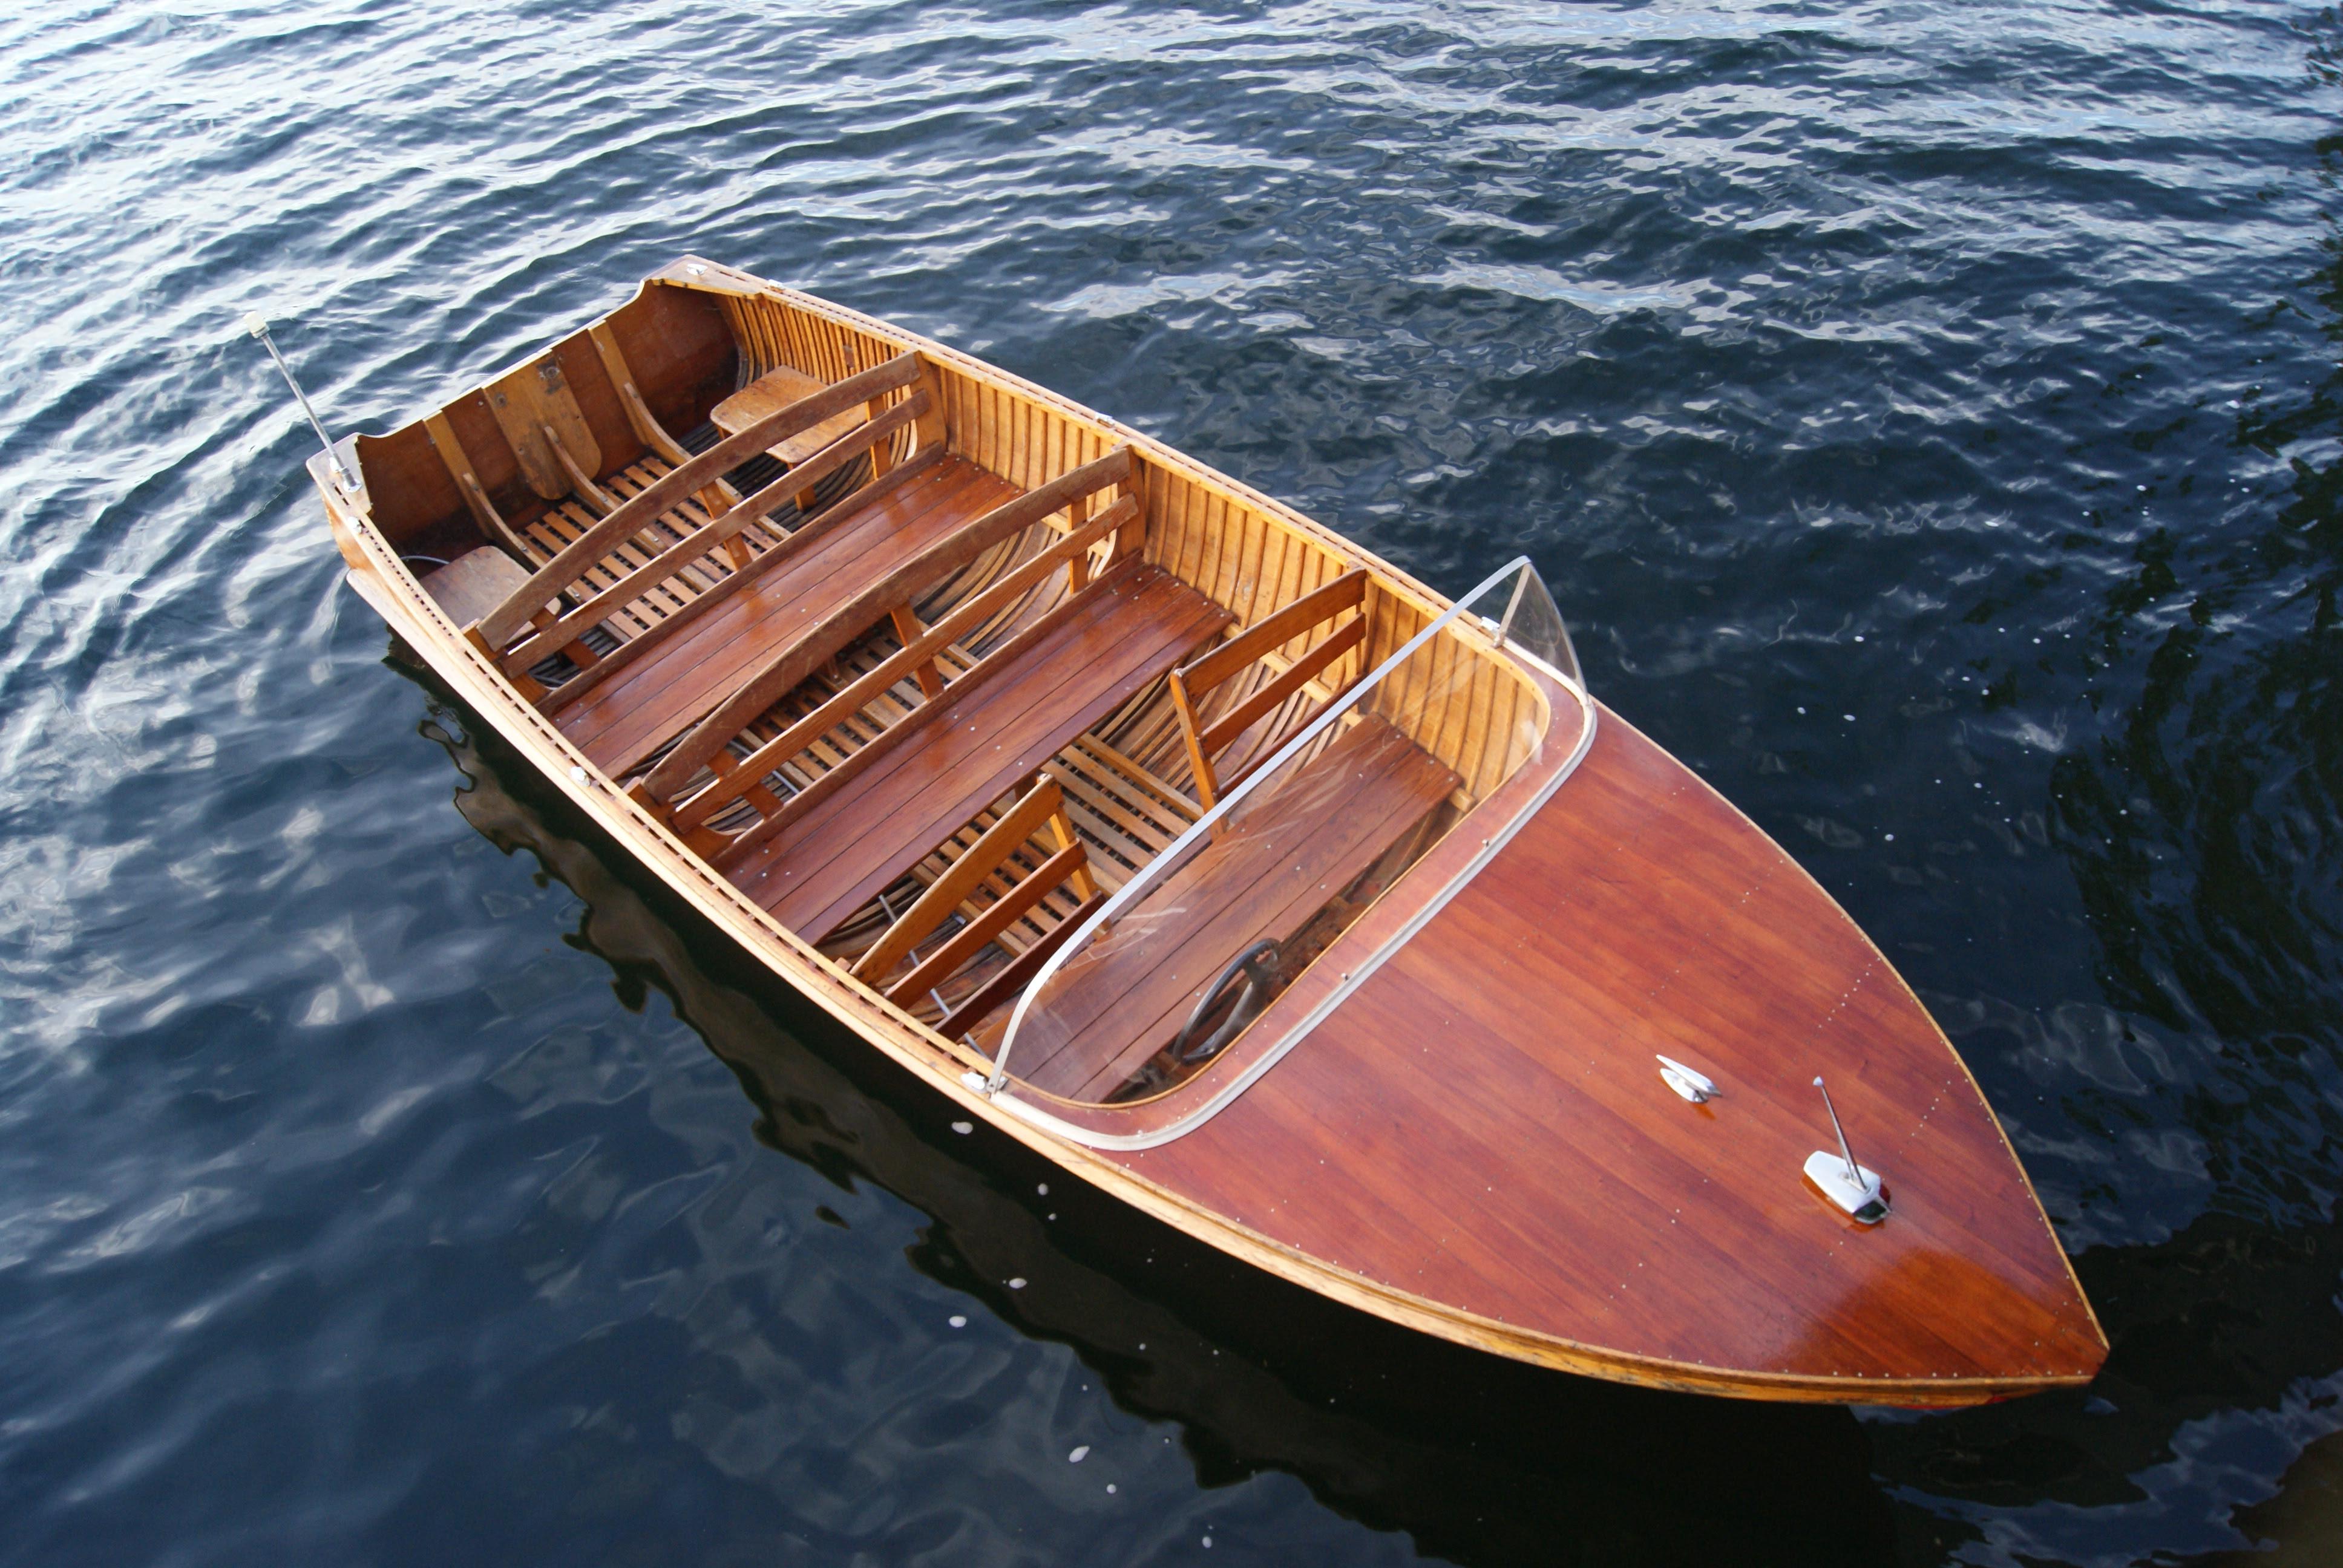 Chris Craft Boat Types | download model boat plans rc